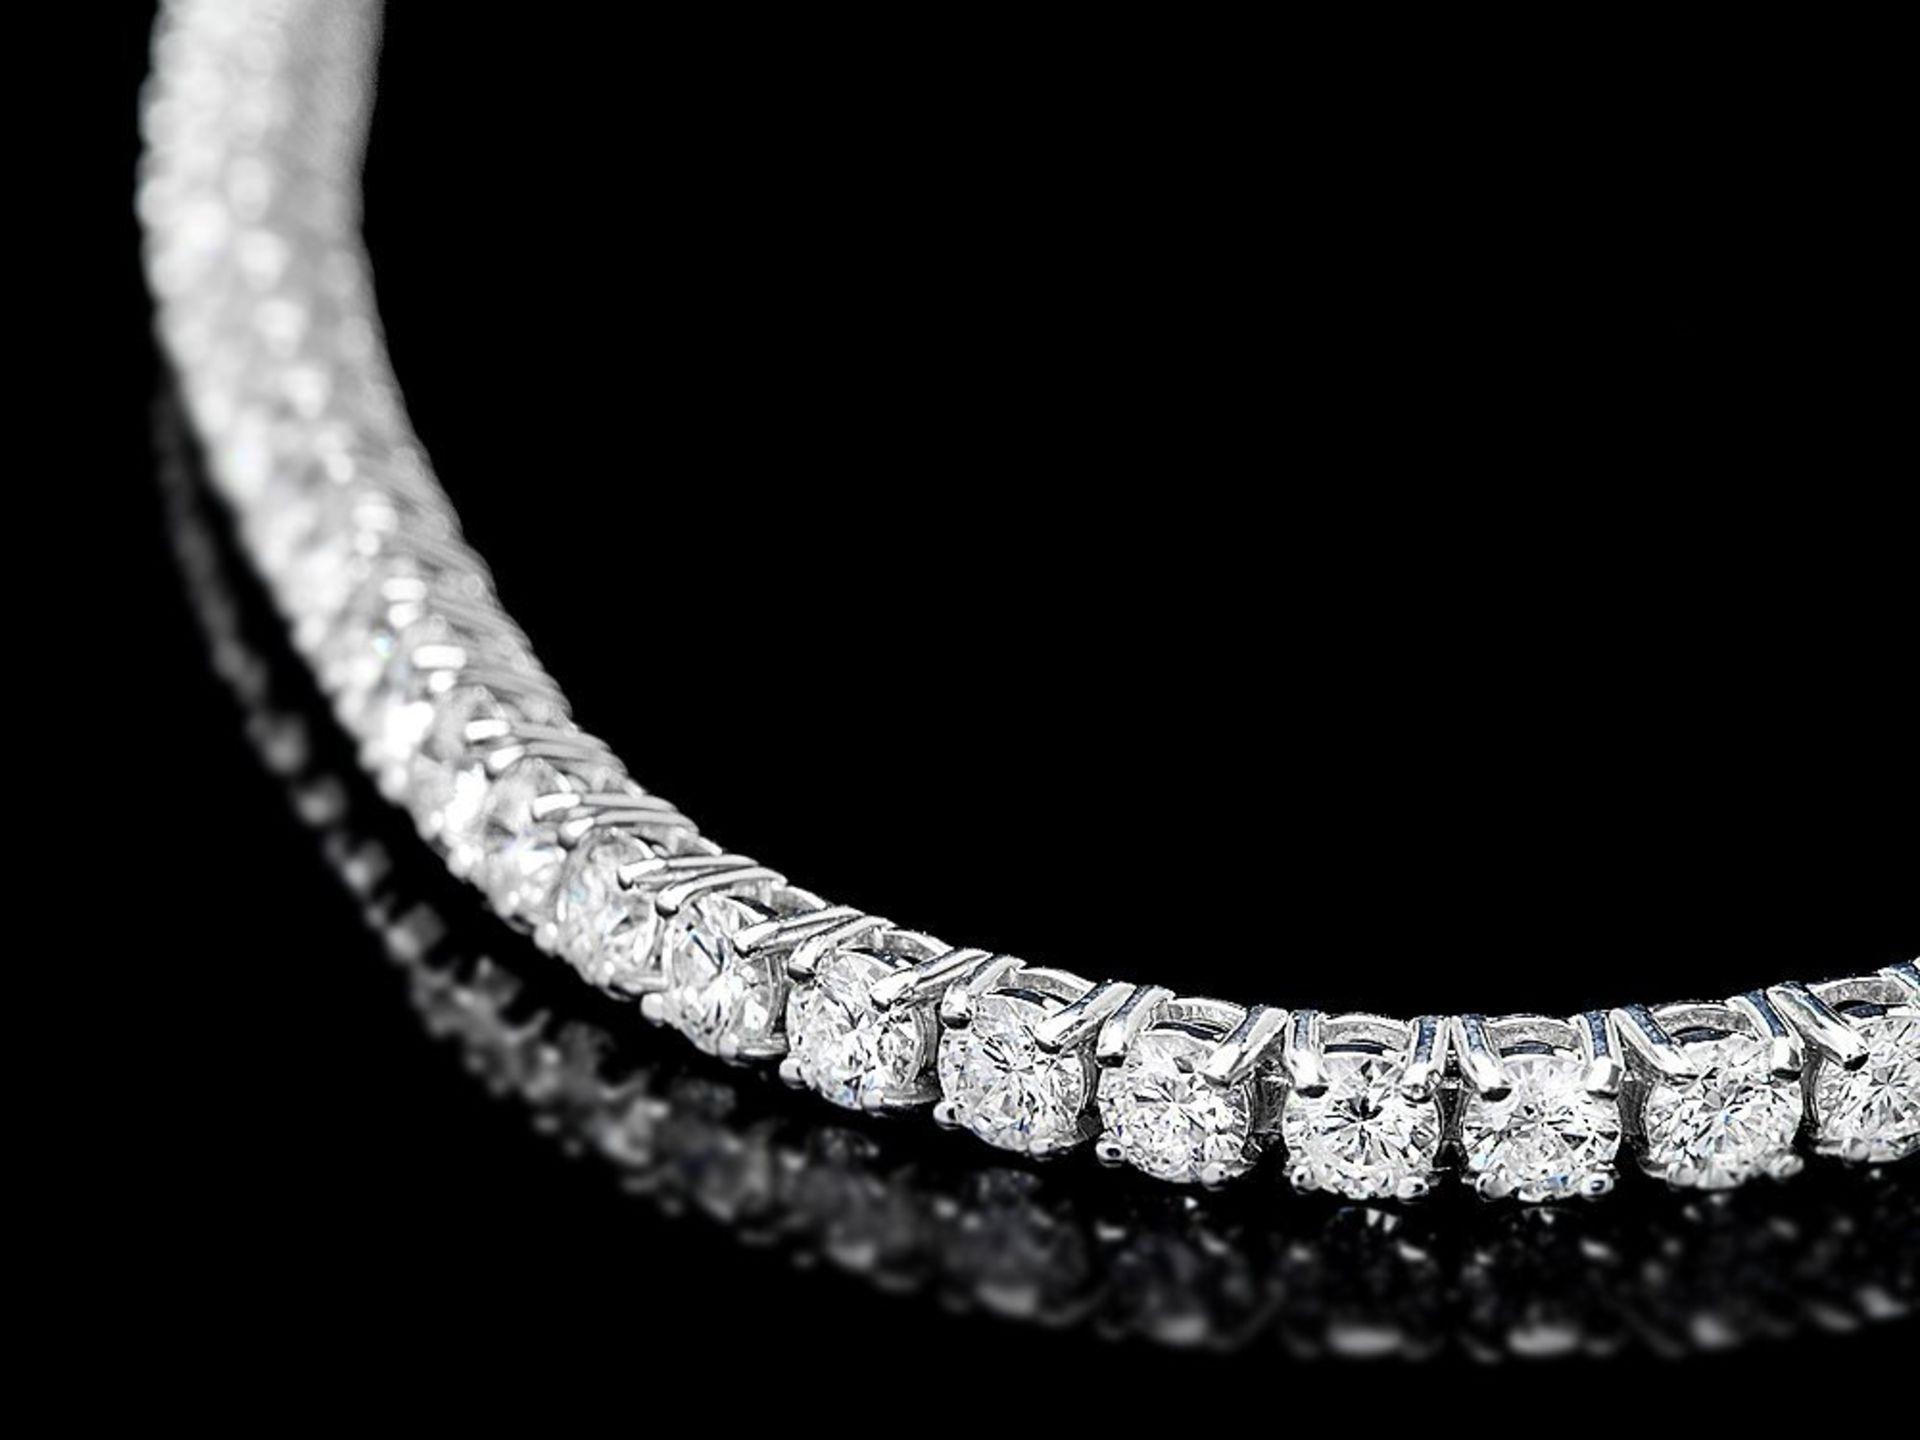 18k White Gold 5.00ct Diamond Bracelet - Image 2 of 3